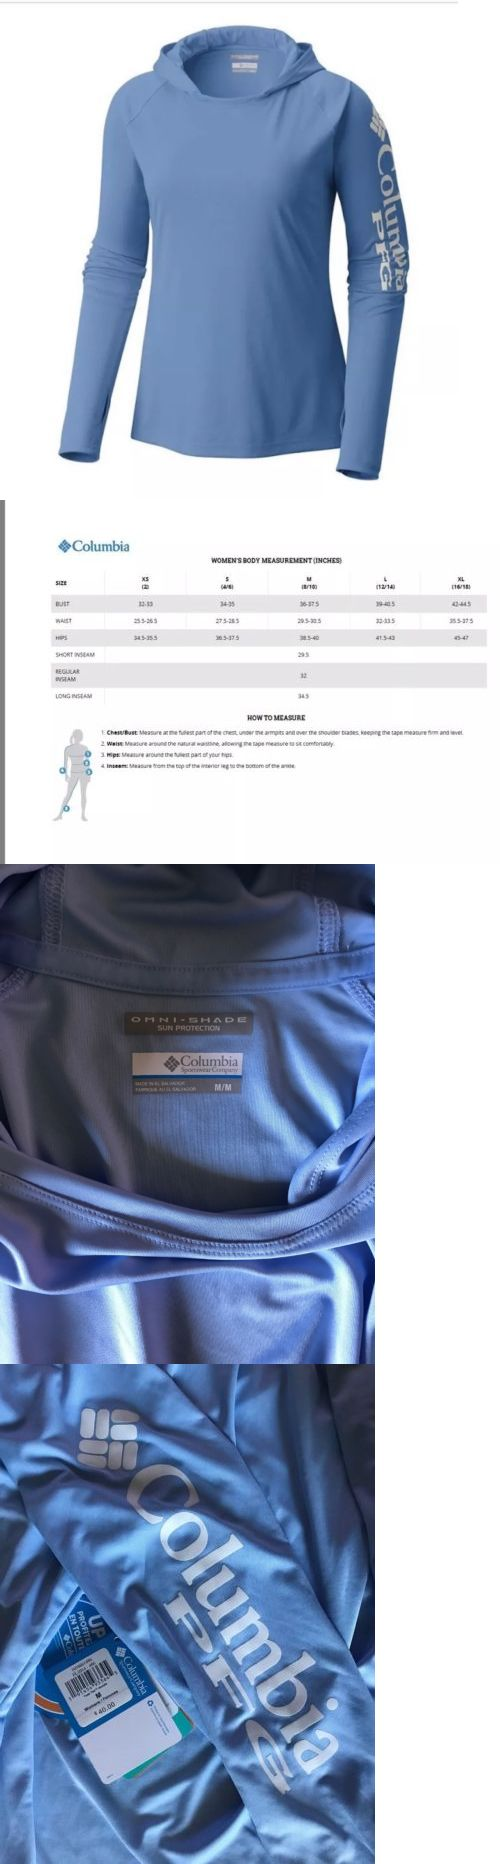 9f2b16768f8 Shirts Tops and Sweaters 181368  Columbia Sportswear Women S Pfg Tidal Tee  Plus Size Hoodie